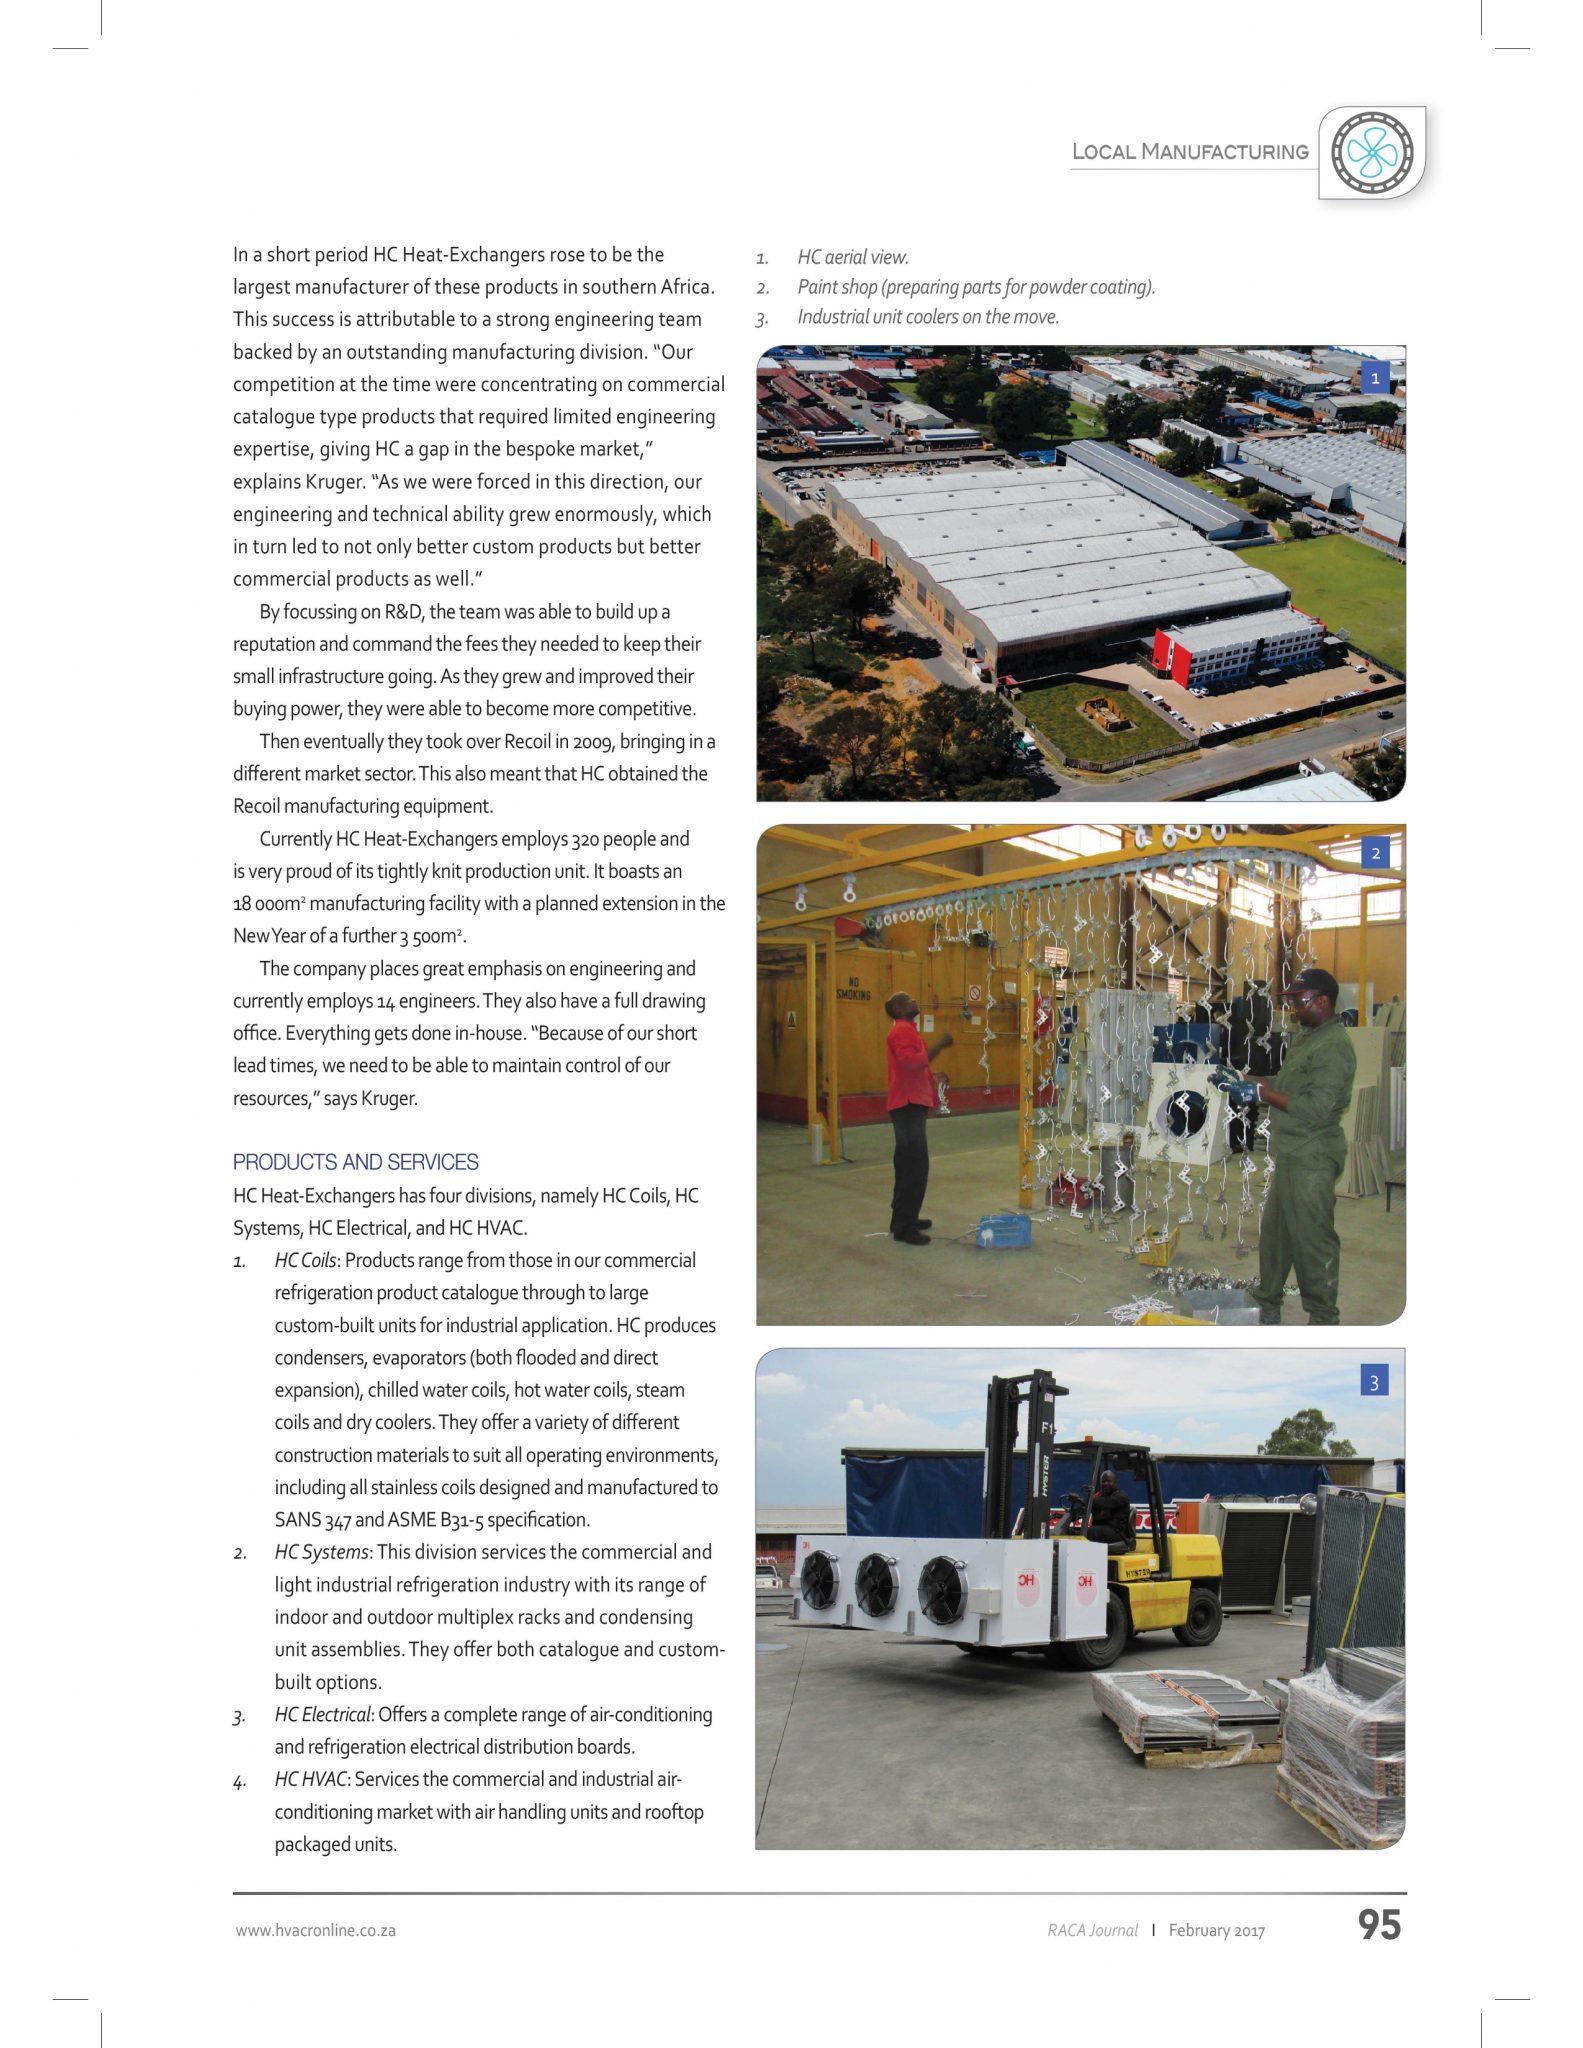 RACA February 2017 1 Page 2